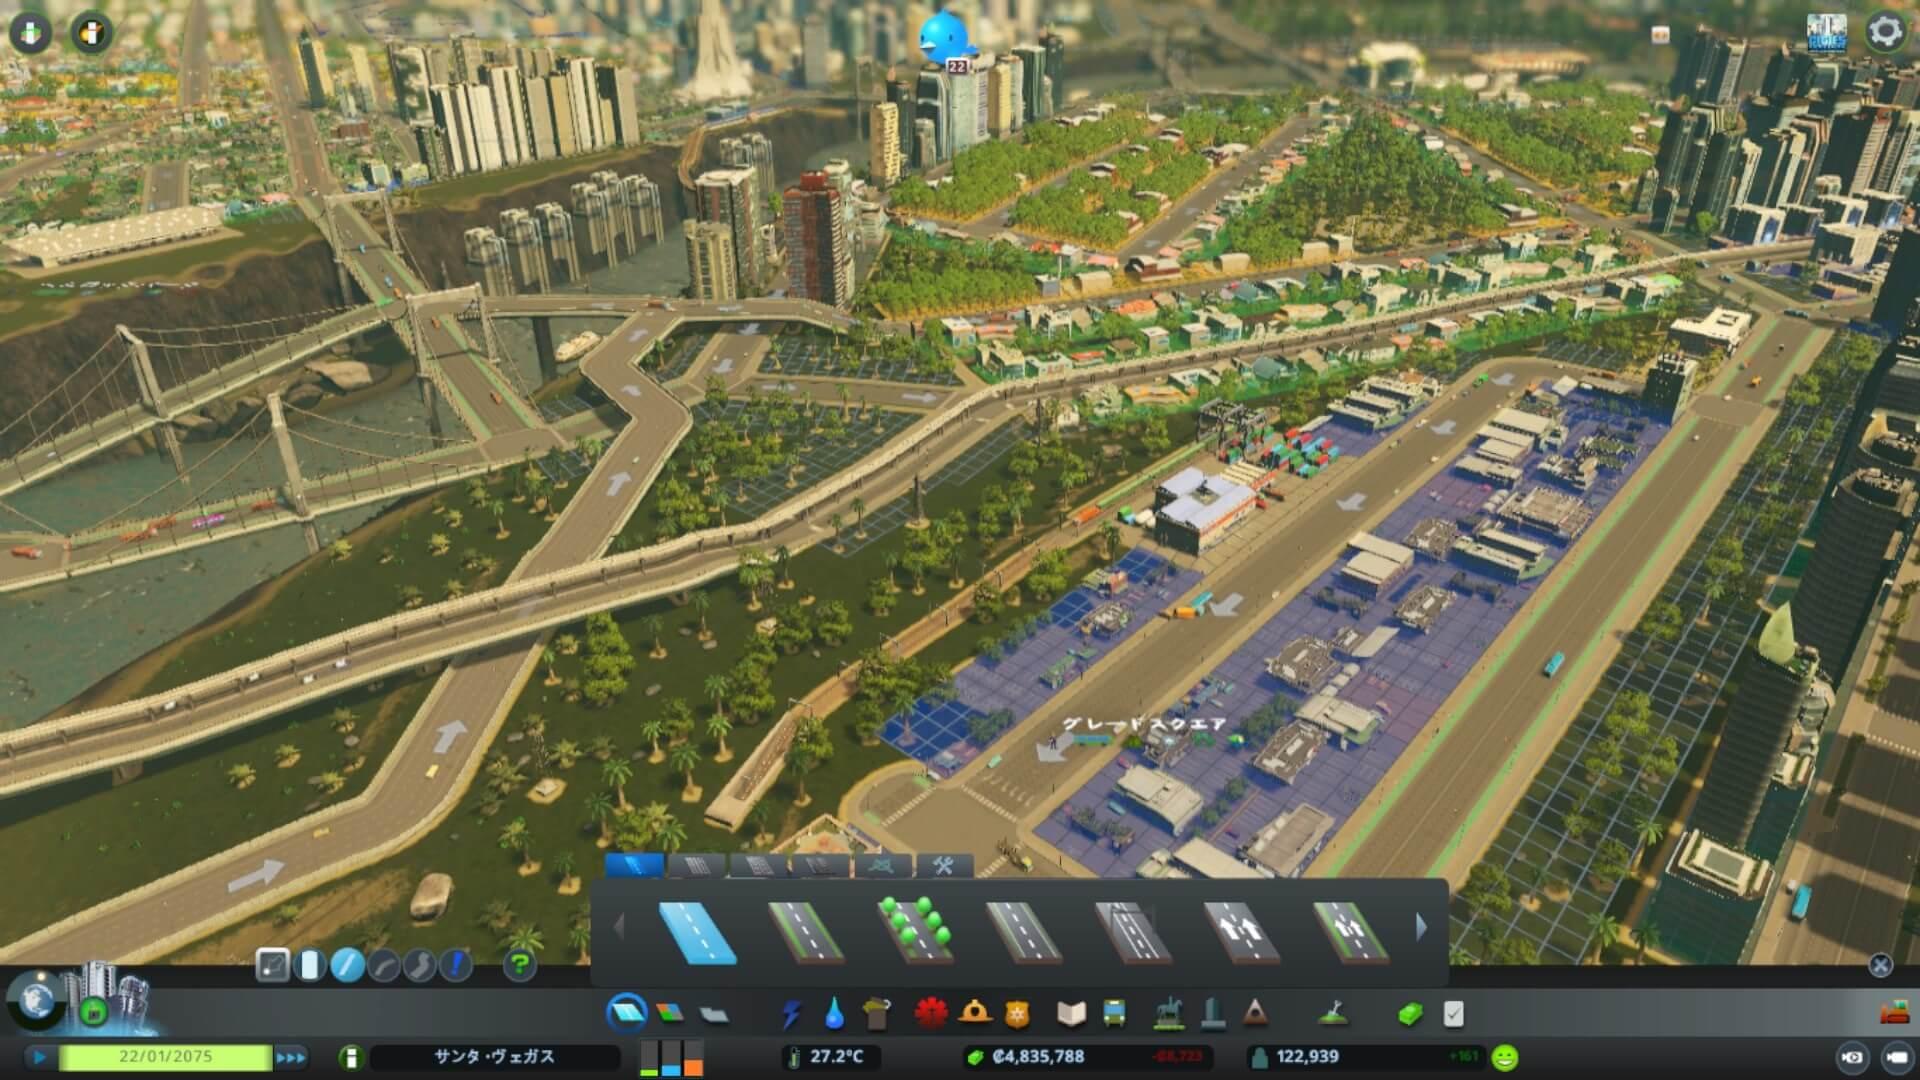 cities-skylines-cargo03-1024x576 【Cities:skylines攻略ブログ】 渋滞しない貨物港駅・貨物ハブの作り方 Cities:Skylines(シティーズ:スカイライン ) 街作りシミュレーションゲーム